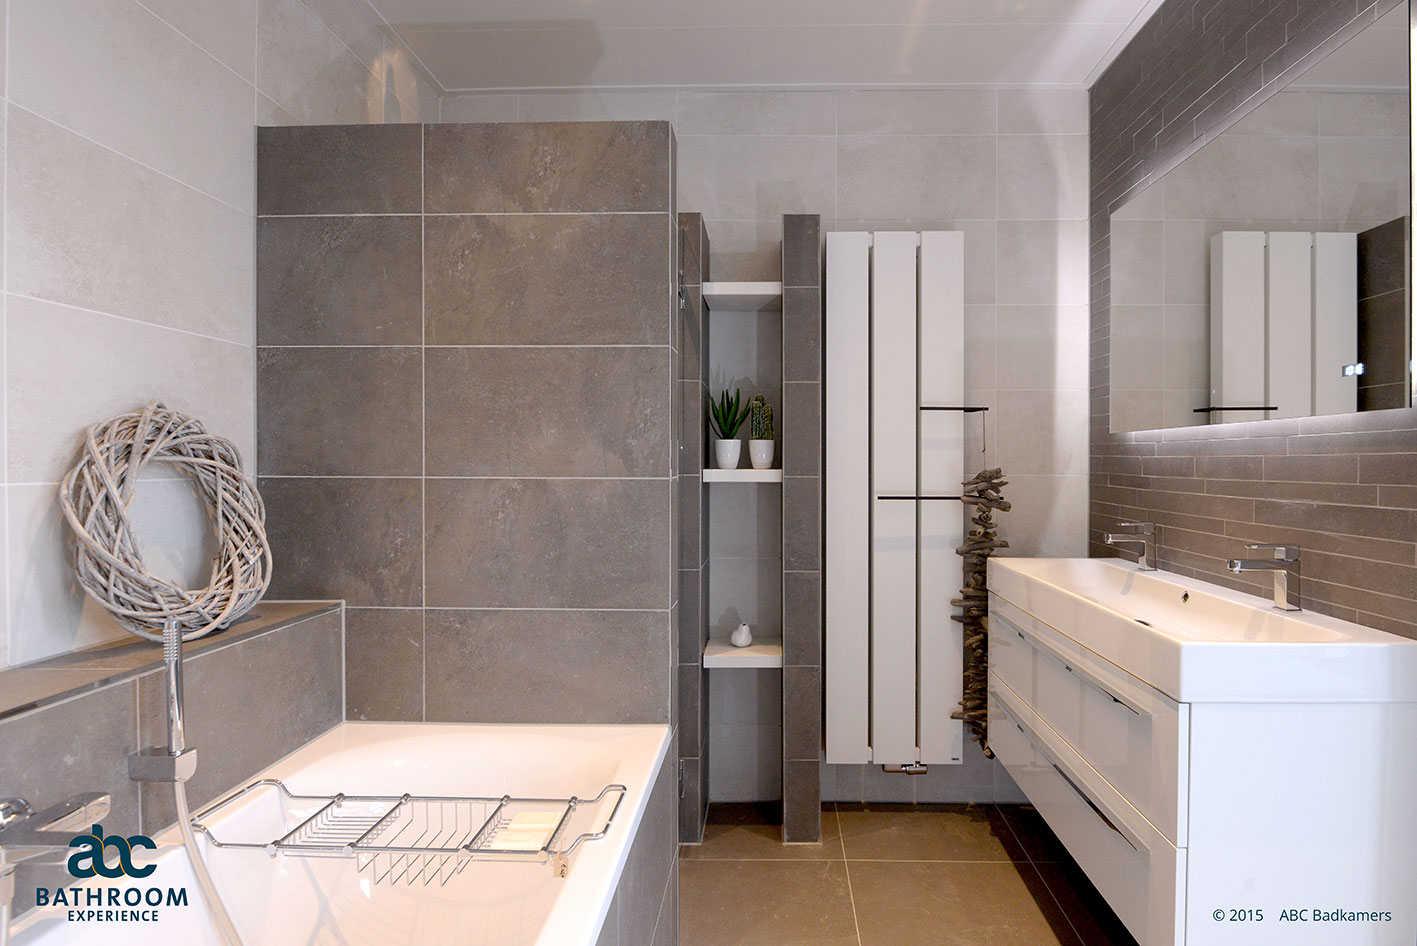 Sanitair En Tegels : Showroom abc badkamers deventer overijssel